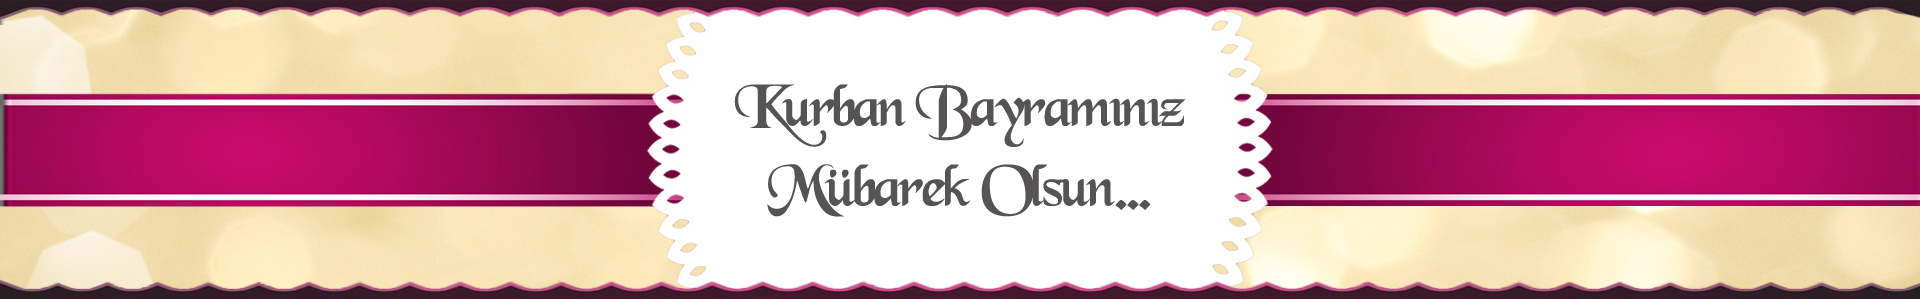 bayram_banner_1920_299